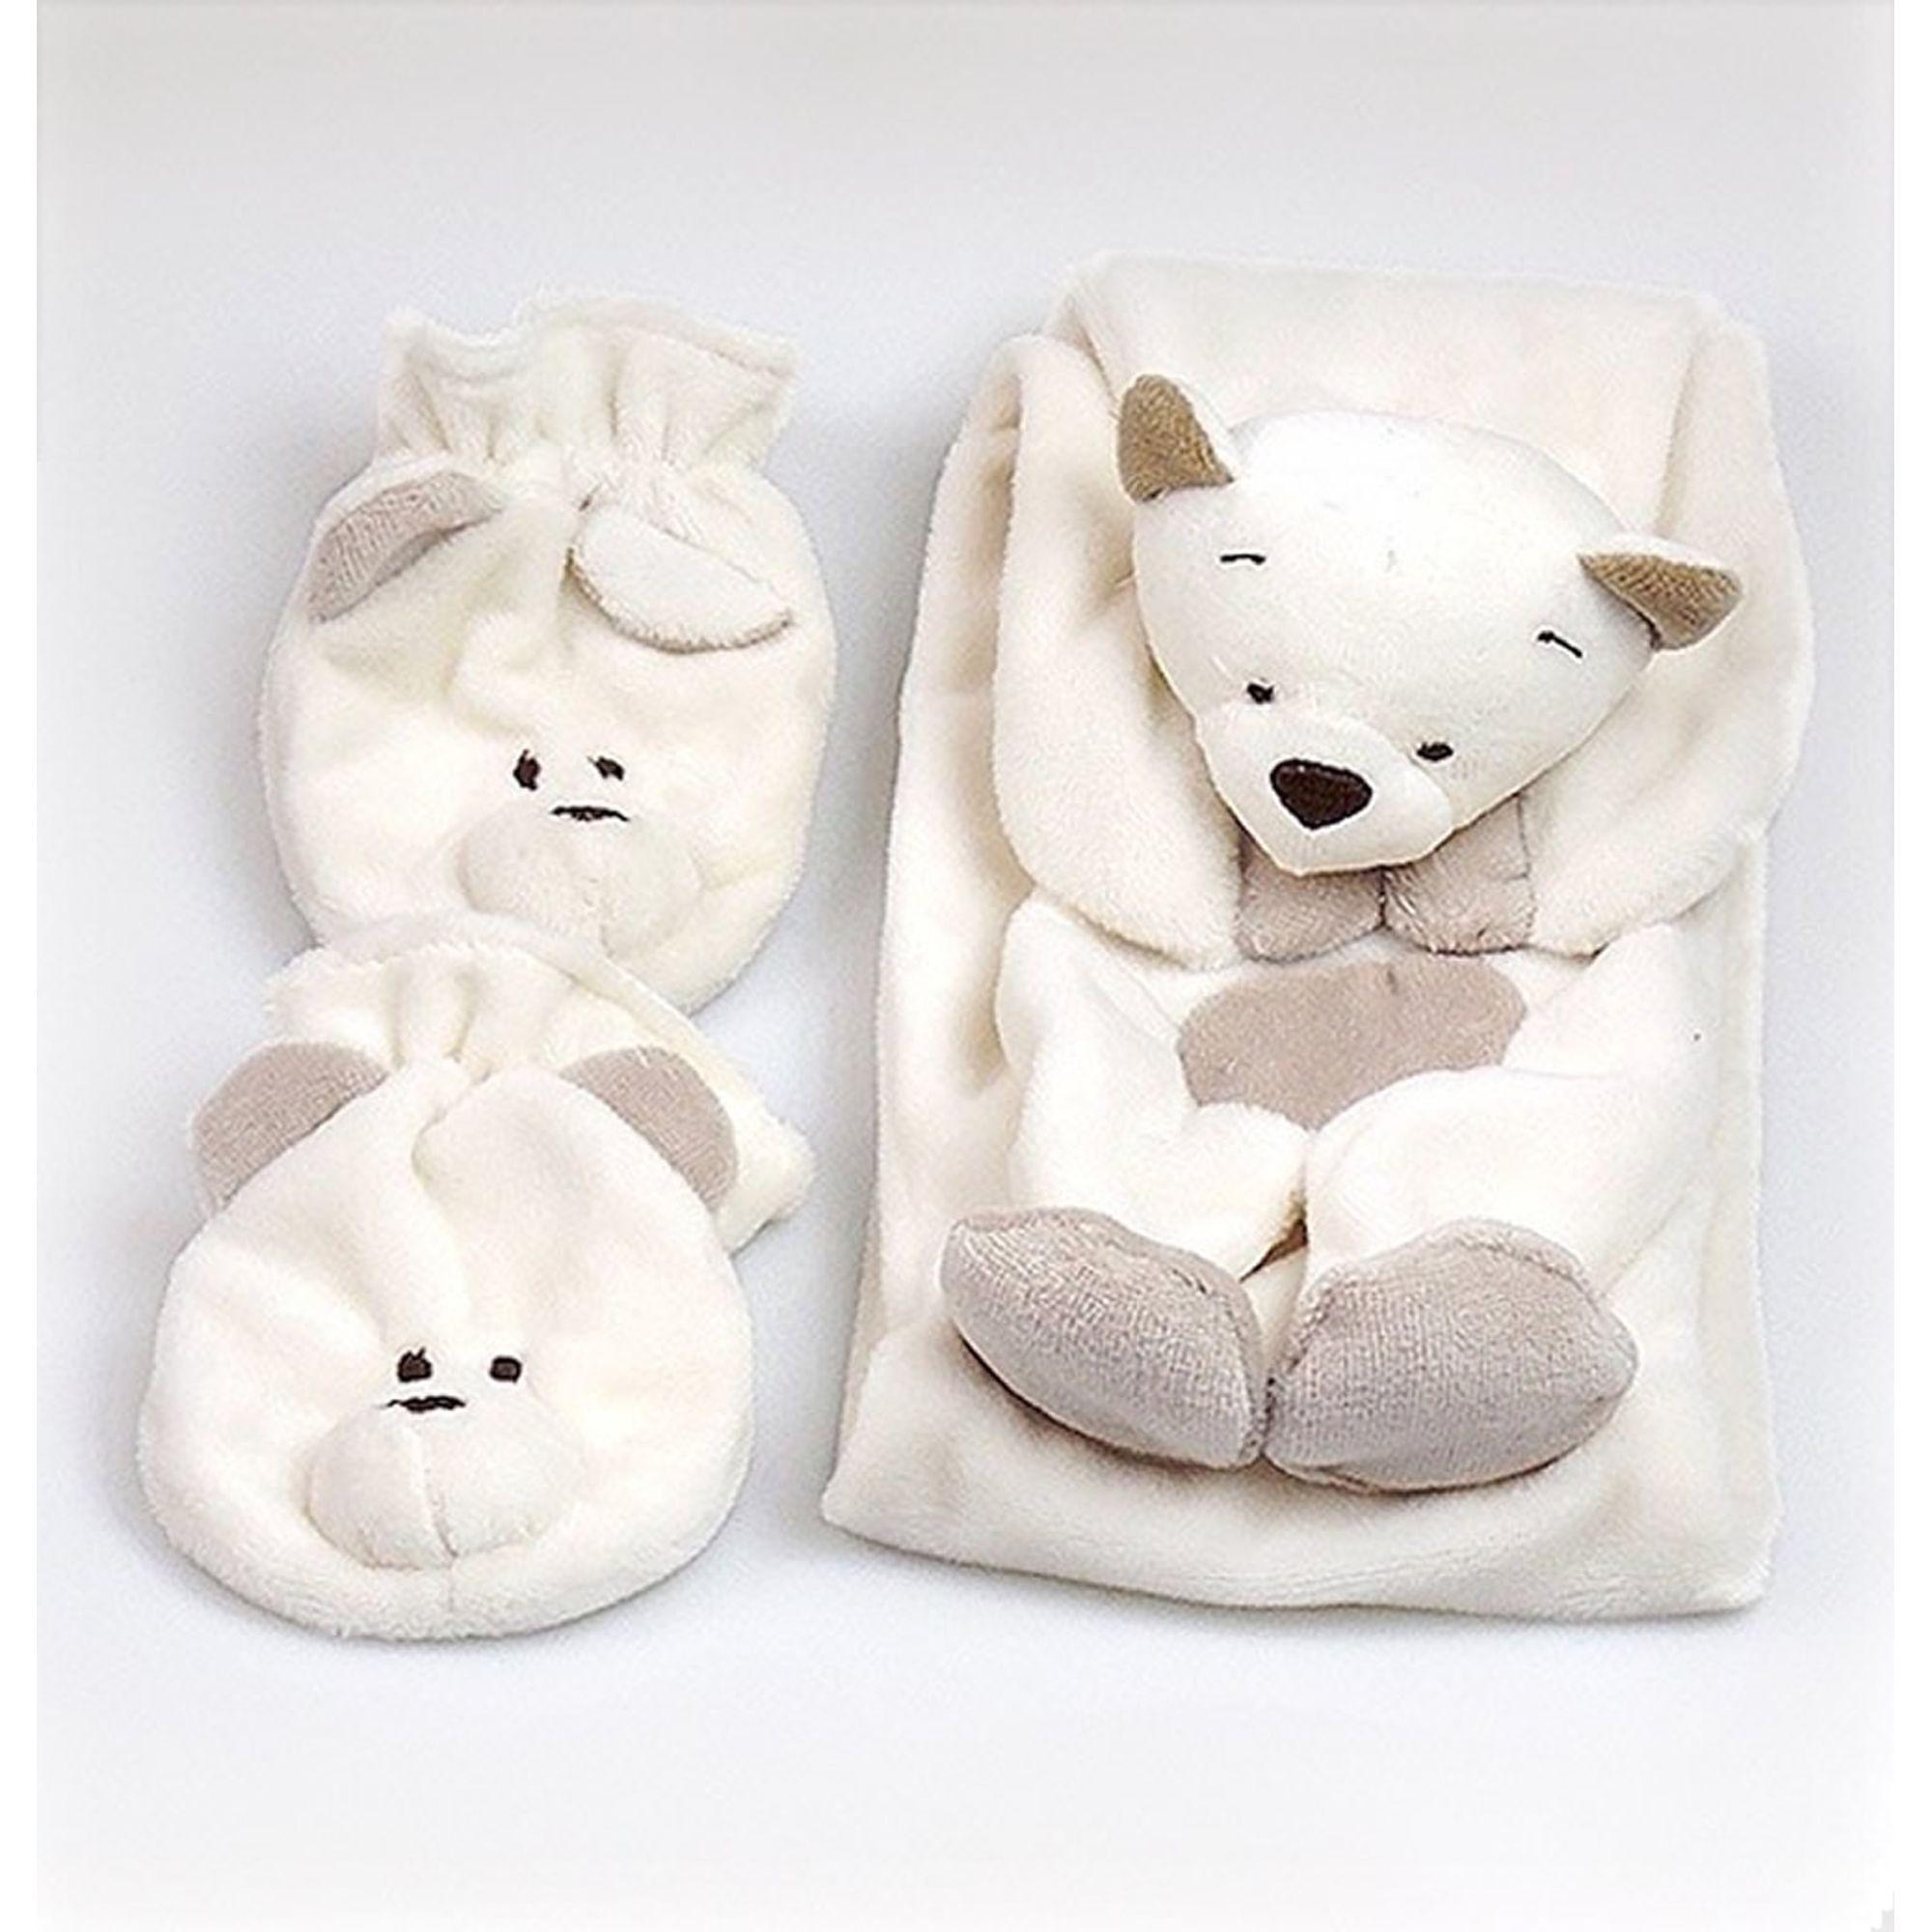 kit-cachecol-luvas-bebe-urso-branco-zip-toys